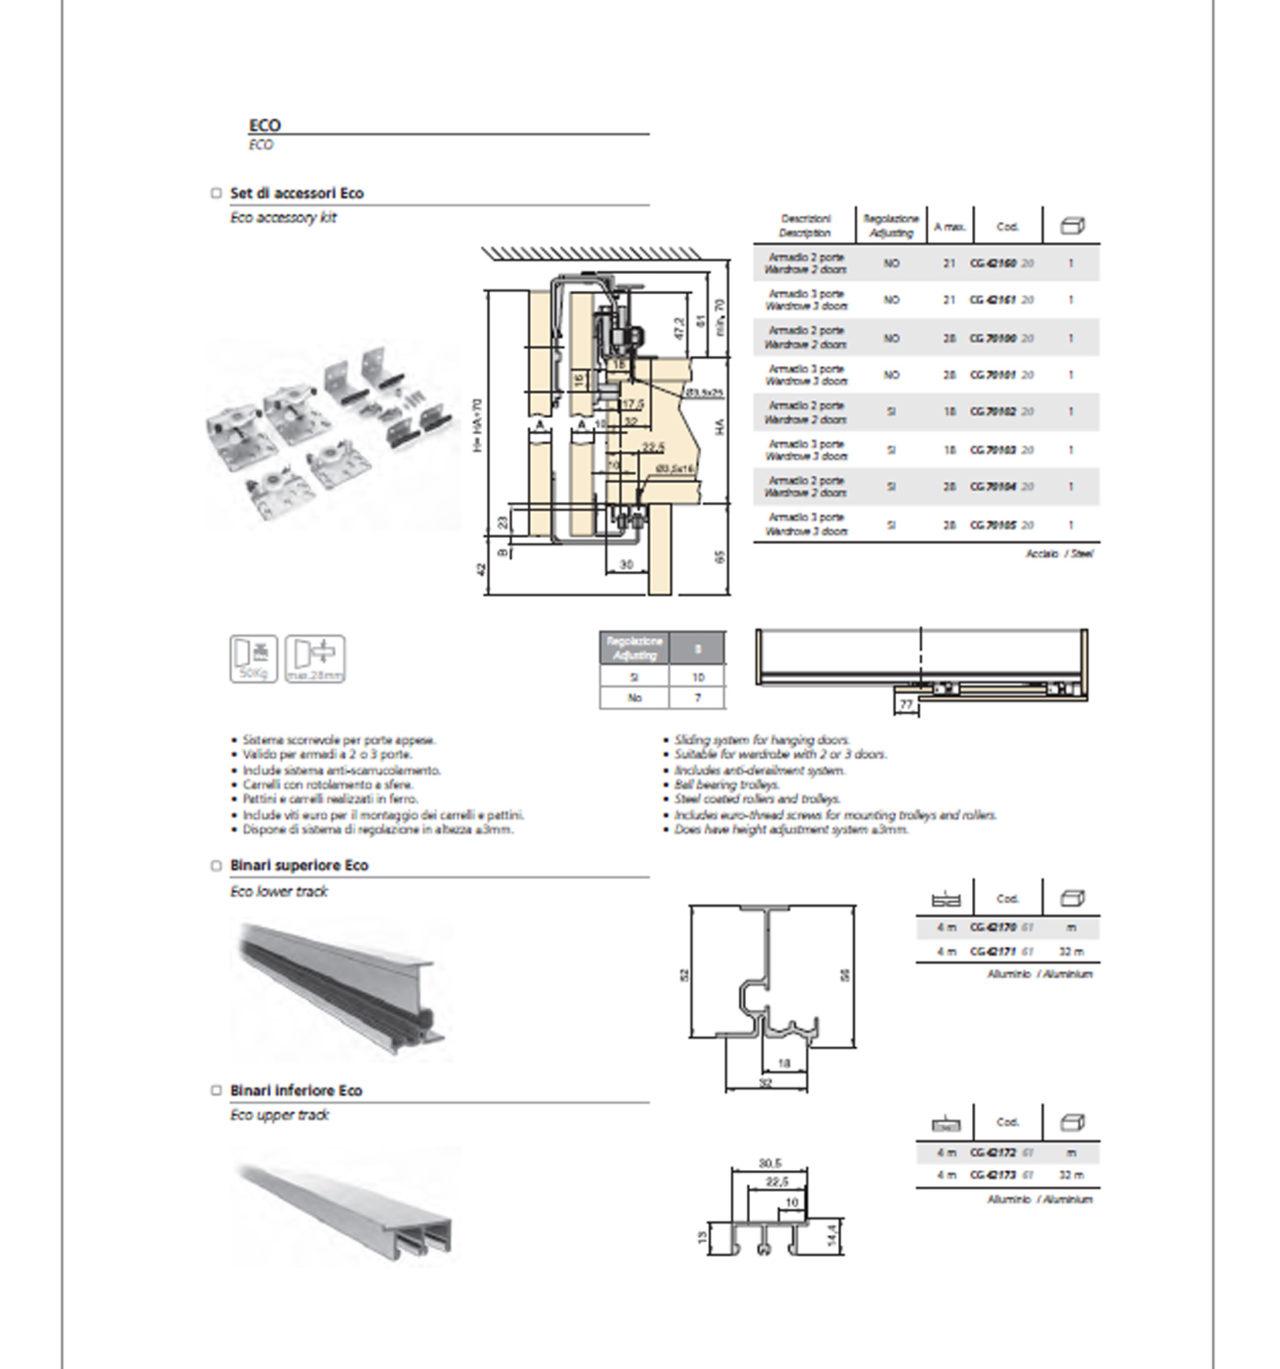 Pagine-da-CG-ferramenta_scorrevoli_guide_IIE-1280x1369.jpg